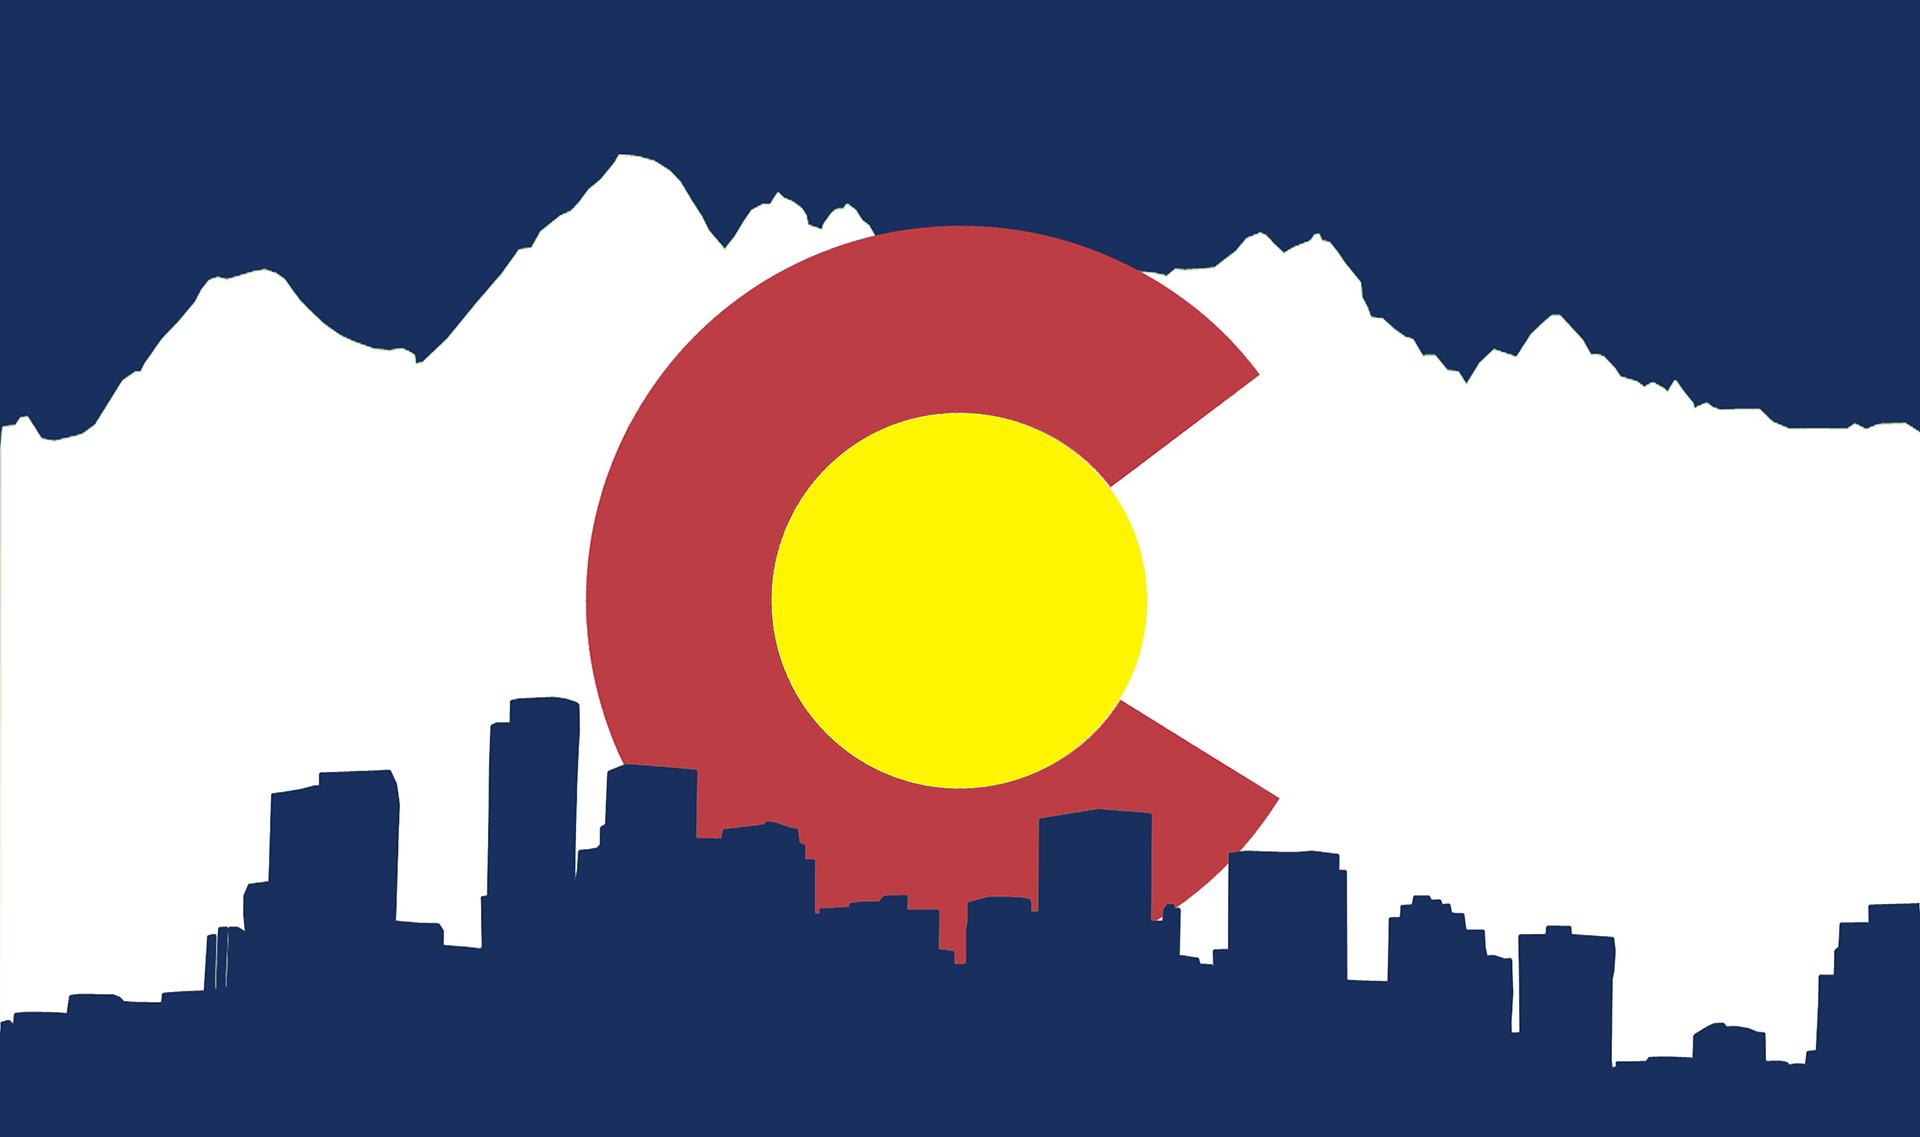 Denver clipart Mountain Clipart 420 2016 CO Games TOUR